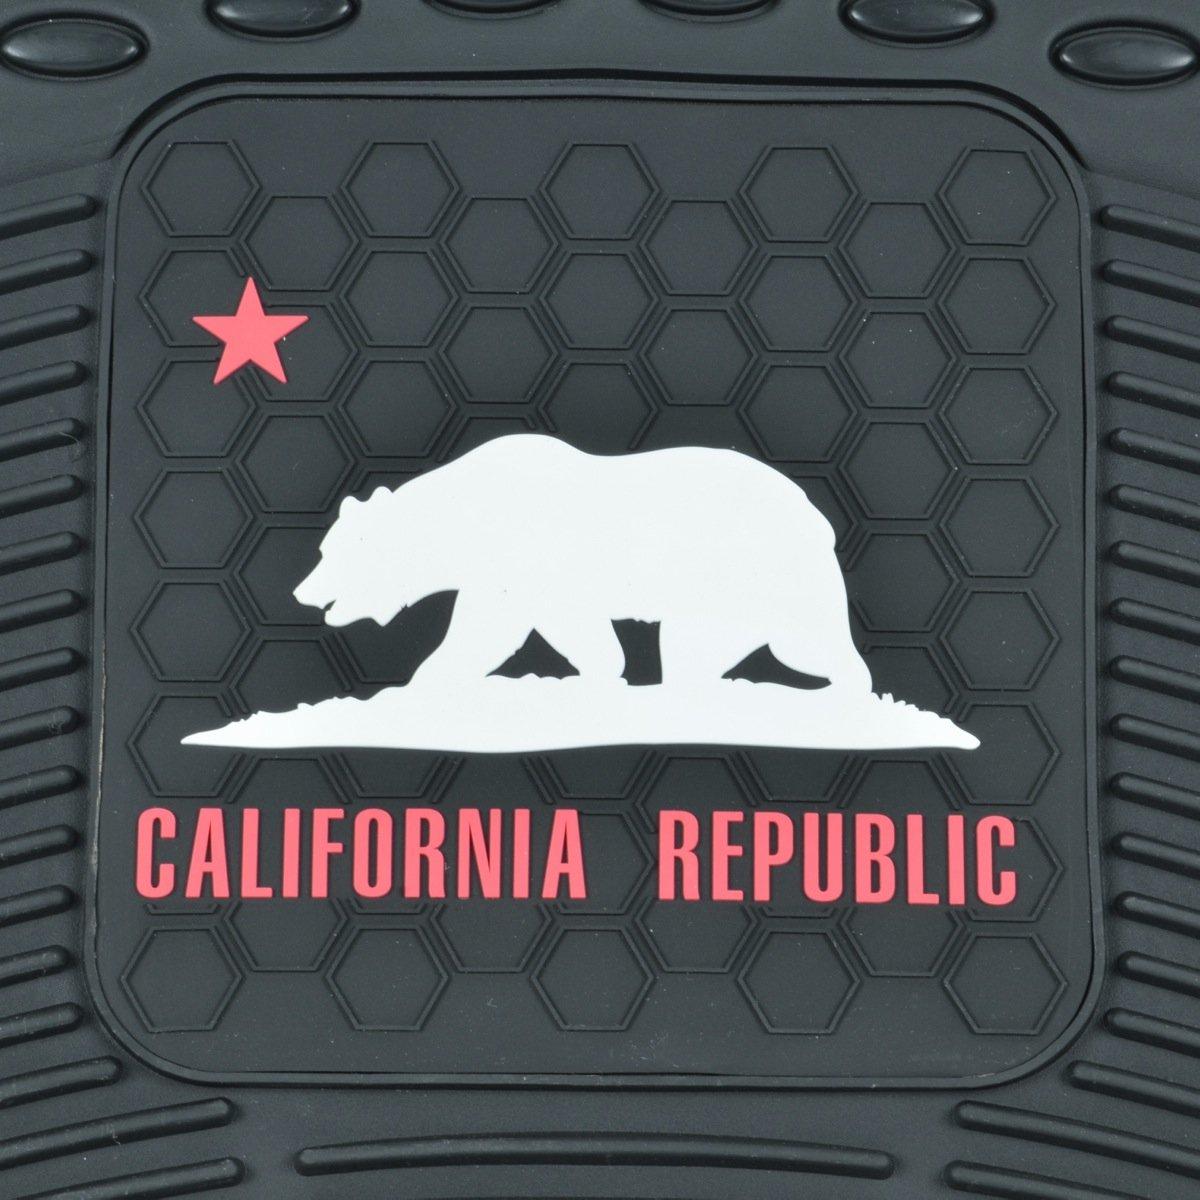 California Rubber-4 Pieces Cal Bear, Heavy Duty All Weather Mat BDK MT-811+MT-802-BK Black Floor